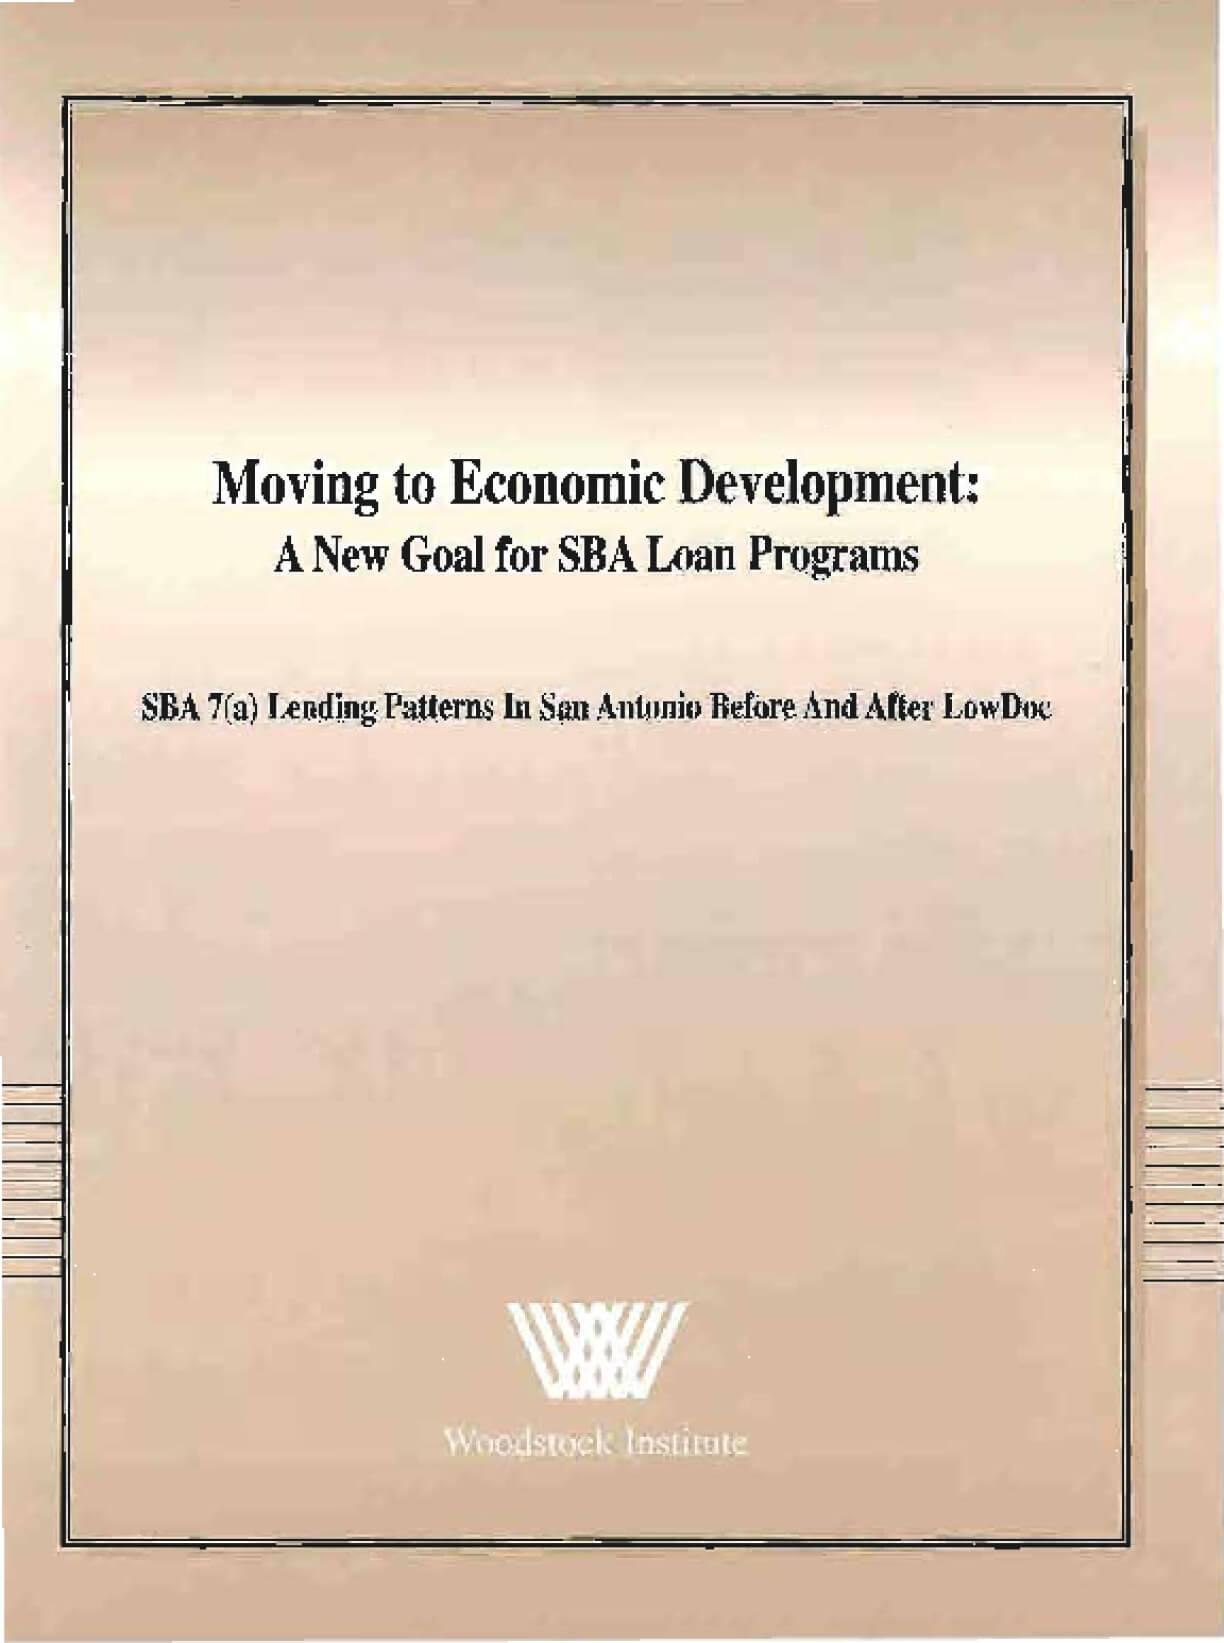 Moving to Economic Development:  A New Goal for SBA Loan Programs